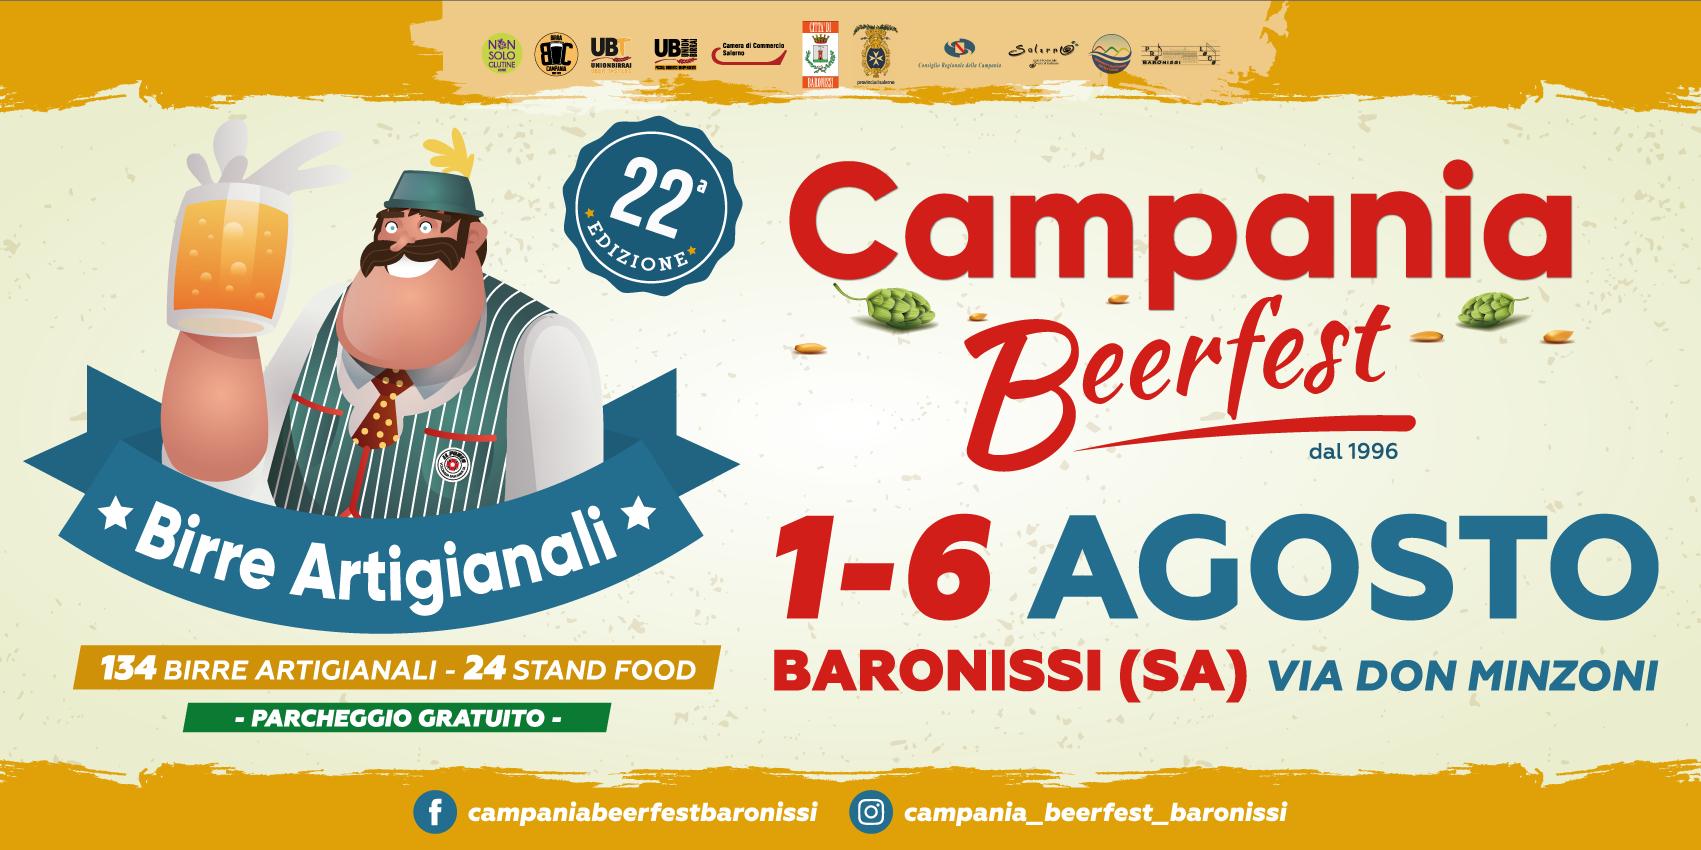 Campania-Beerfest